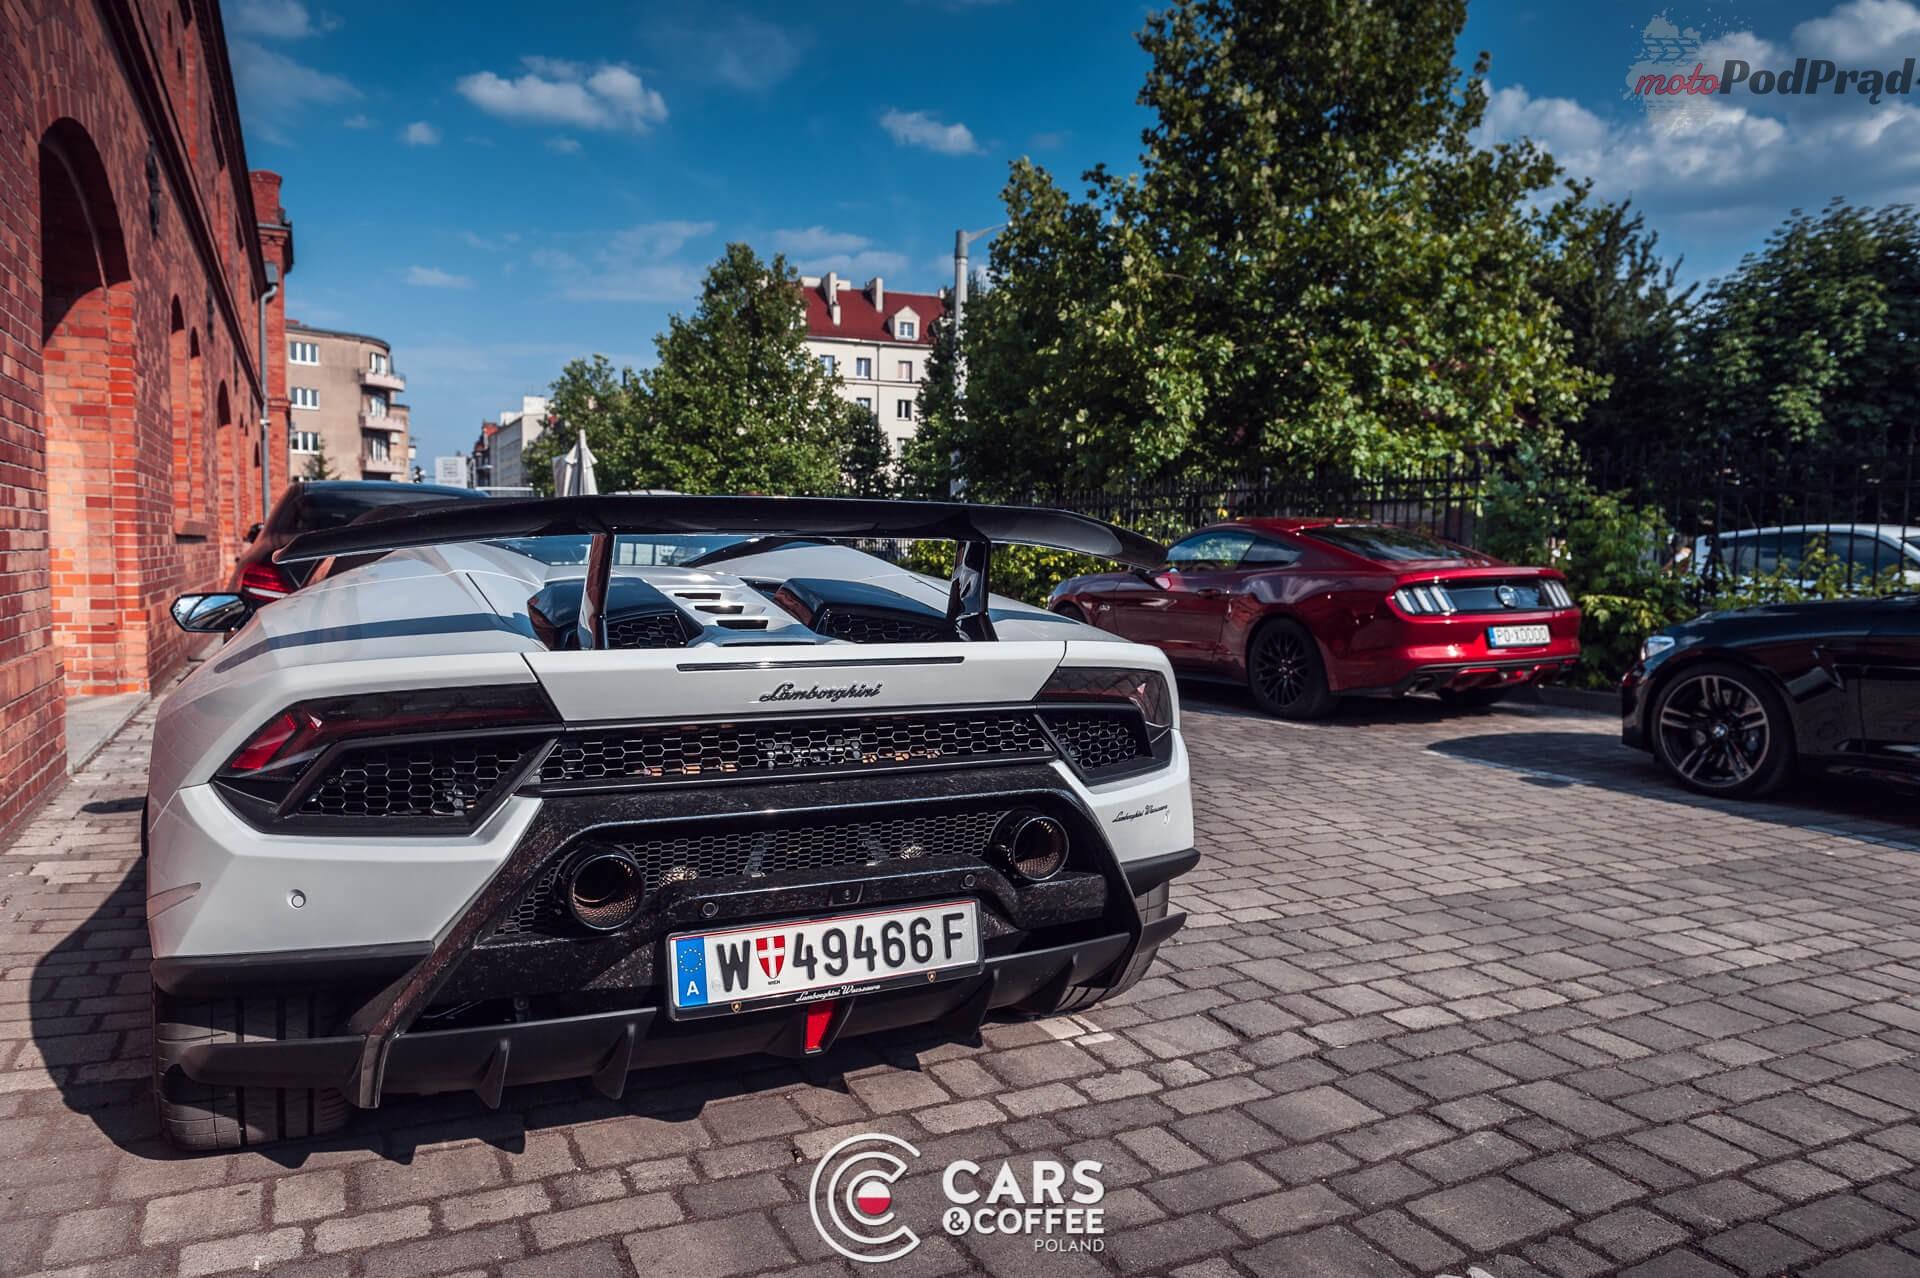 cars and coffee 6 Cars & Coffee Poland – Poznań 2018